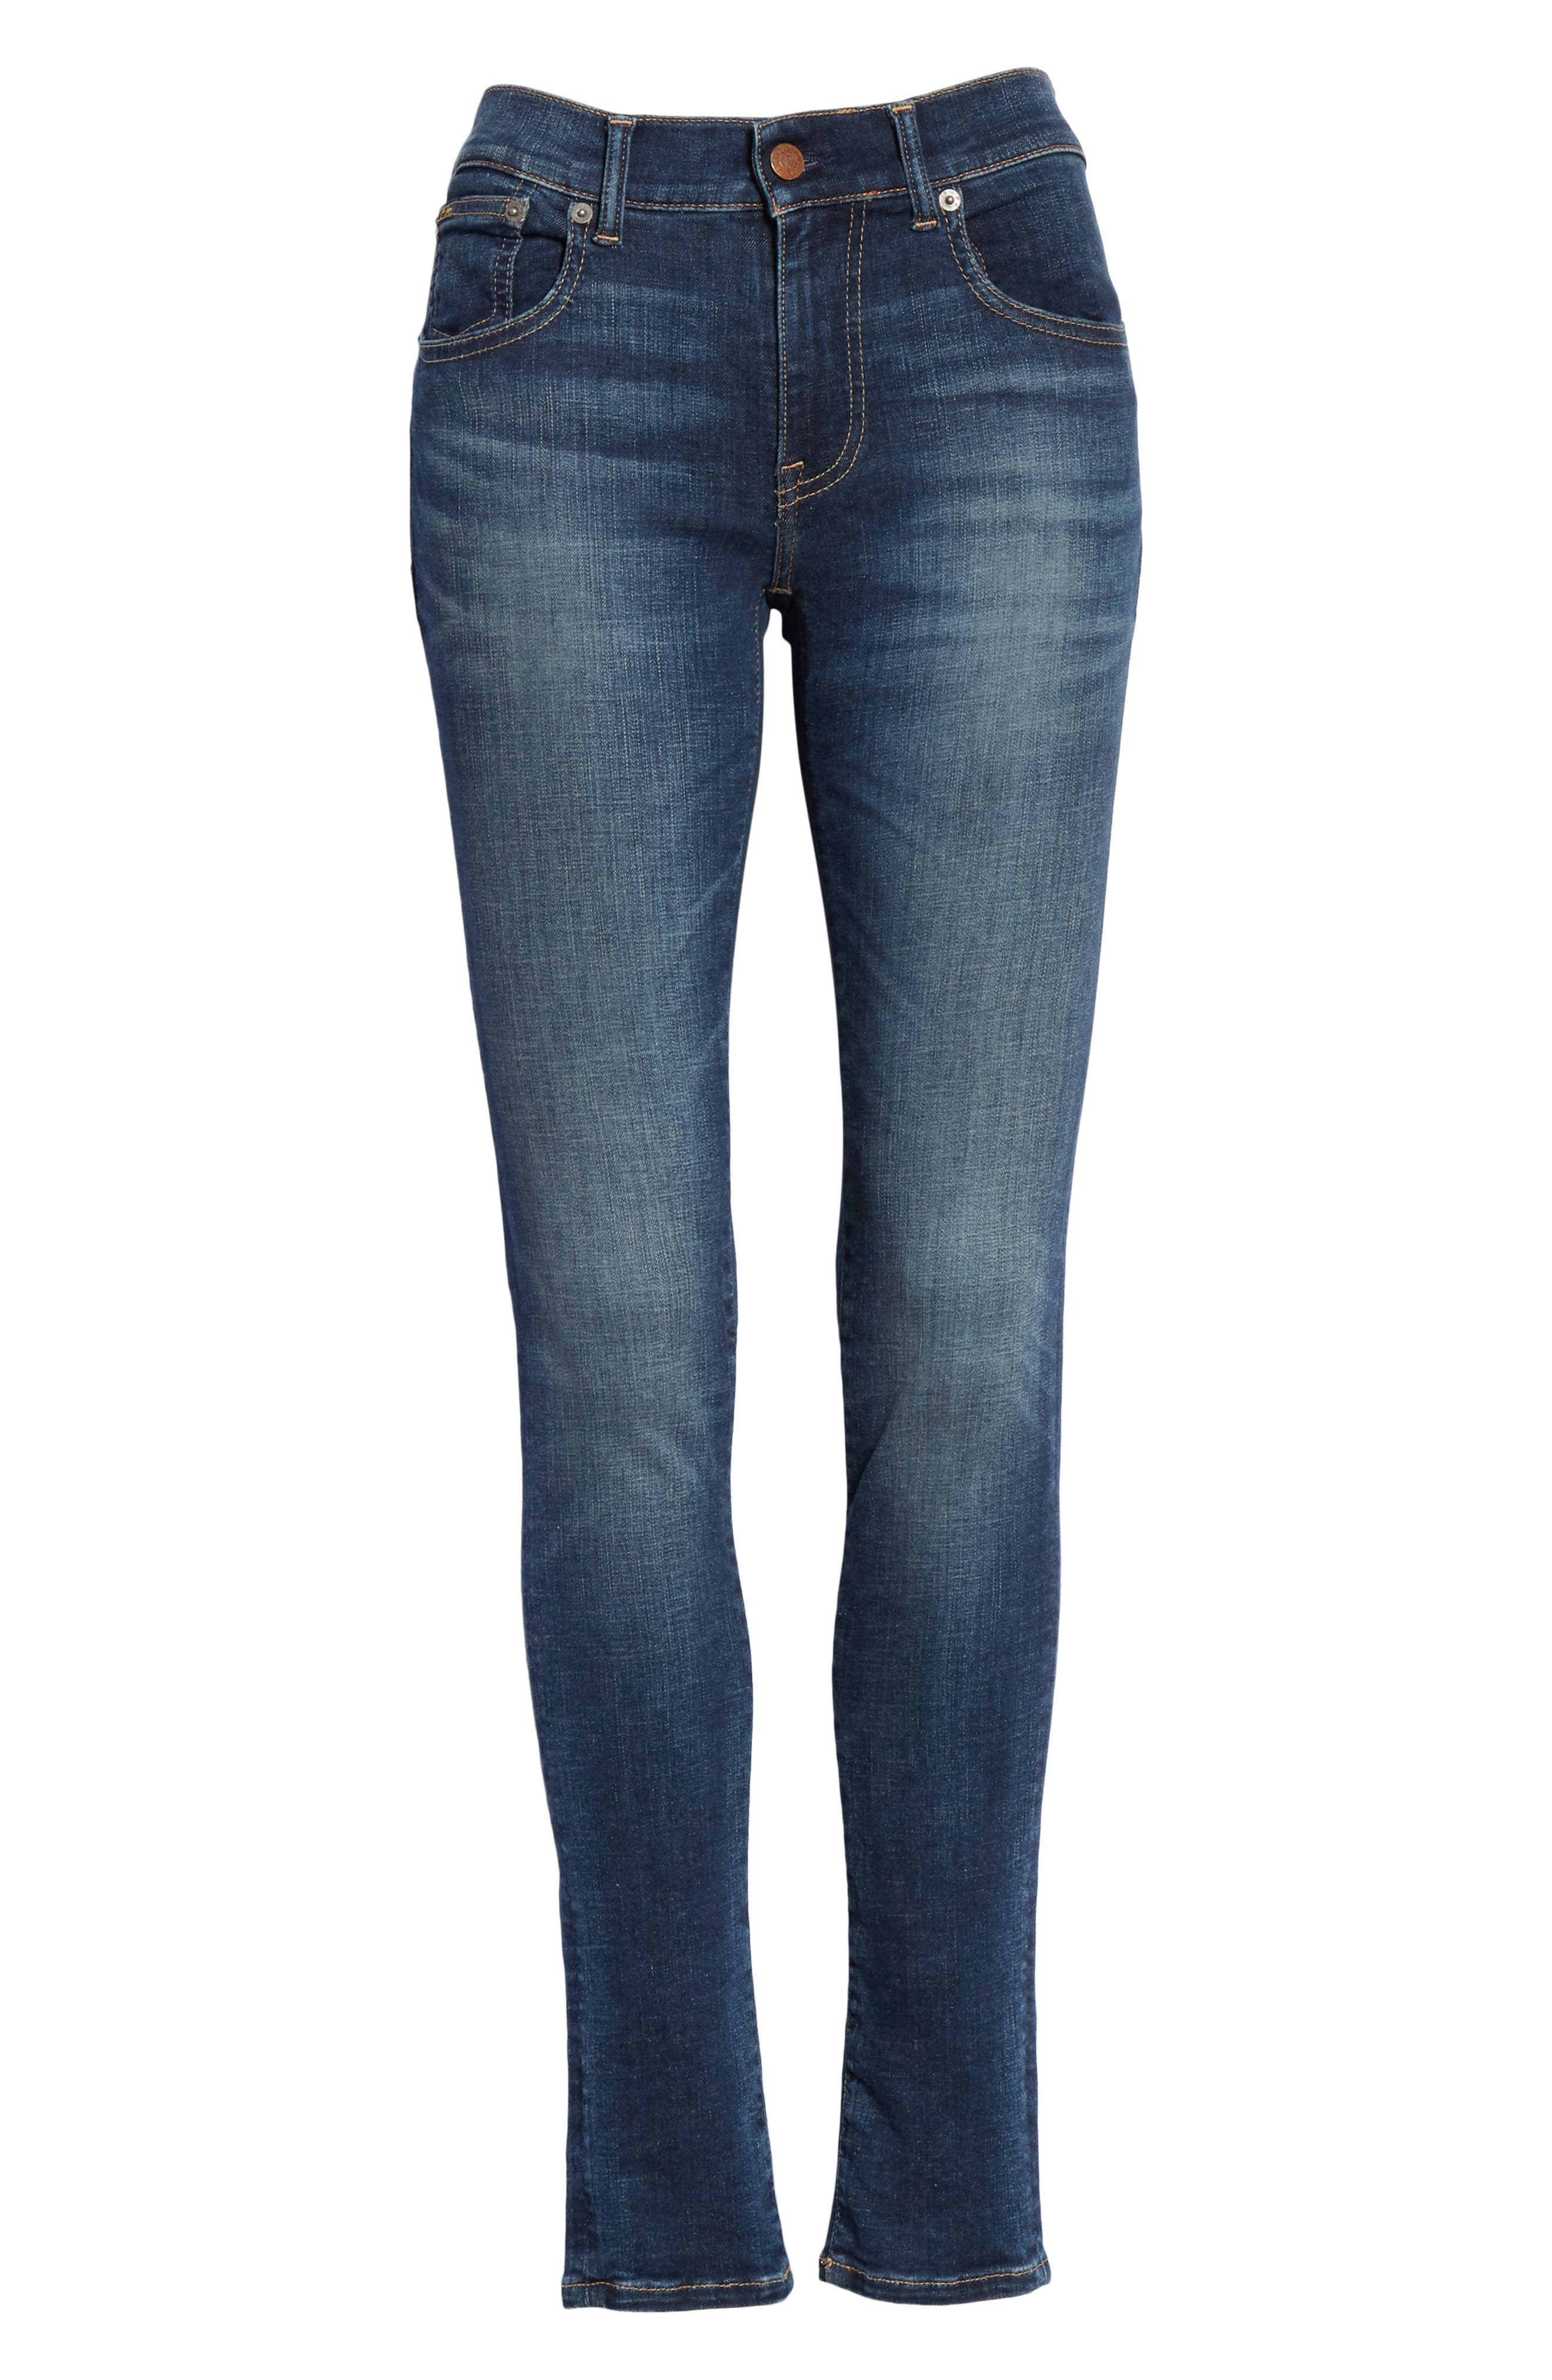 Super Skinny Jeans,                             Alternate thumbnail 6, color,                             DARK INDIGO